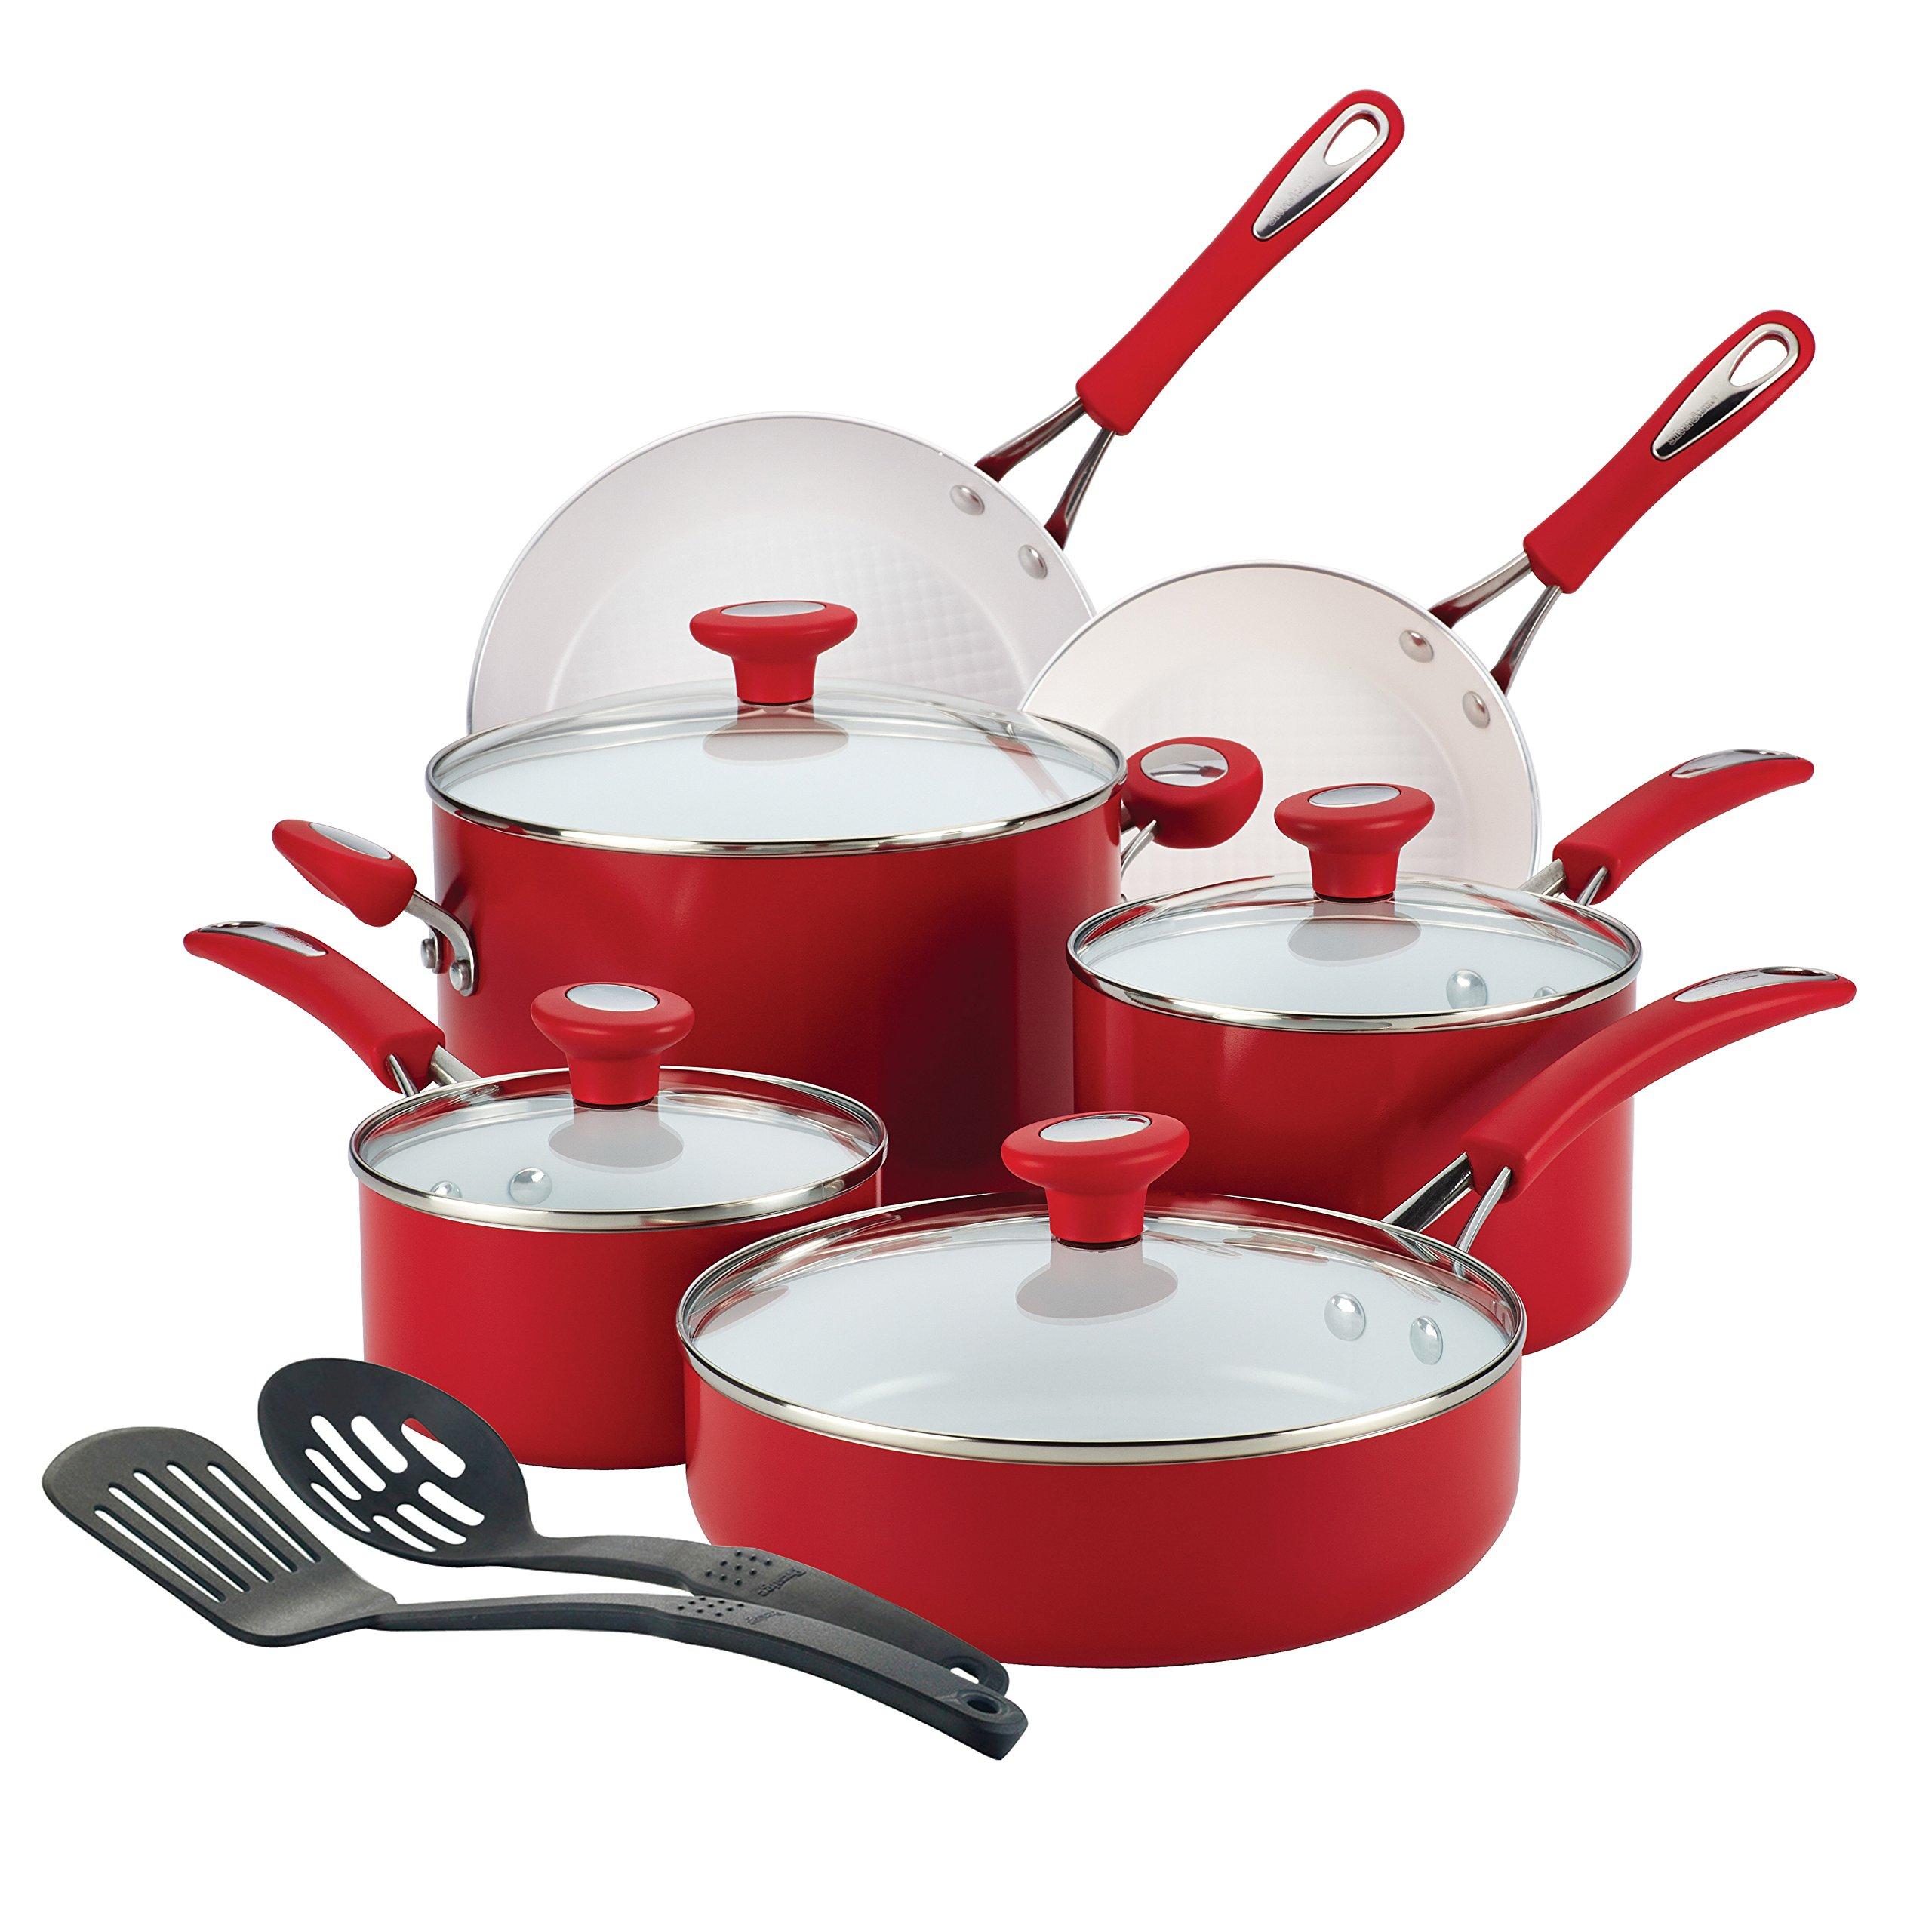 Aluminum Shatter Resistant 12-Piece Ceramic Nonstick Red Cookware Set